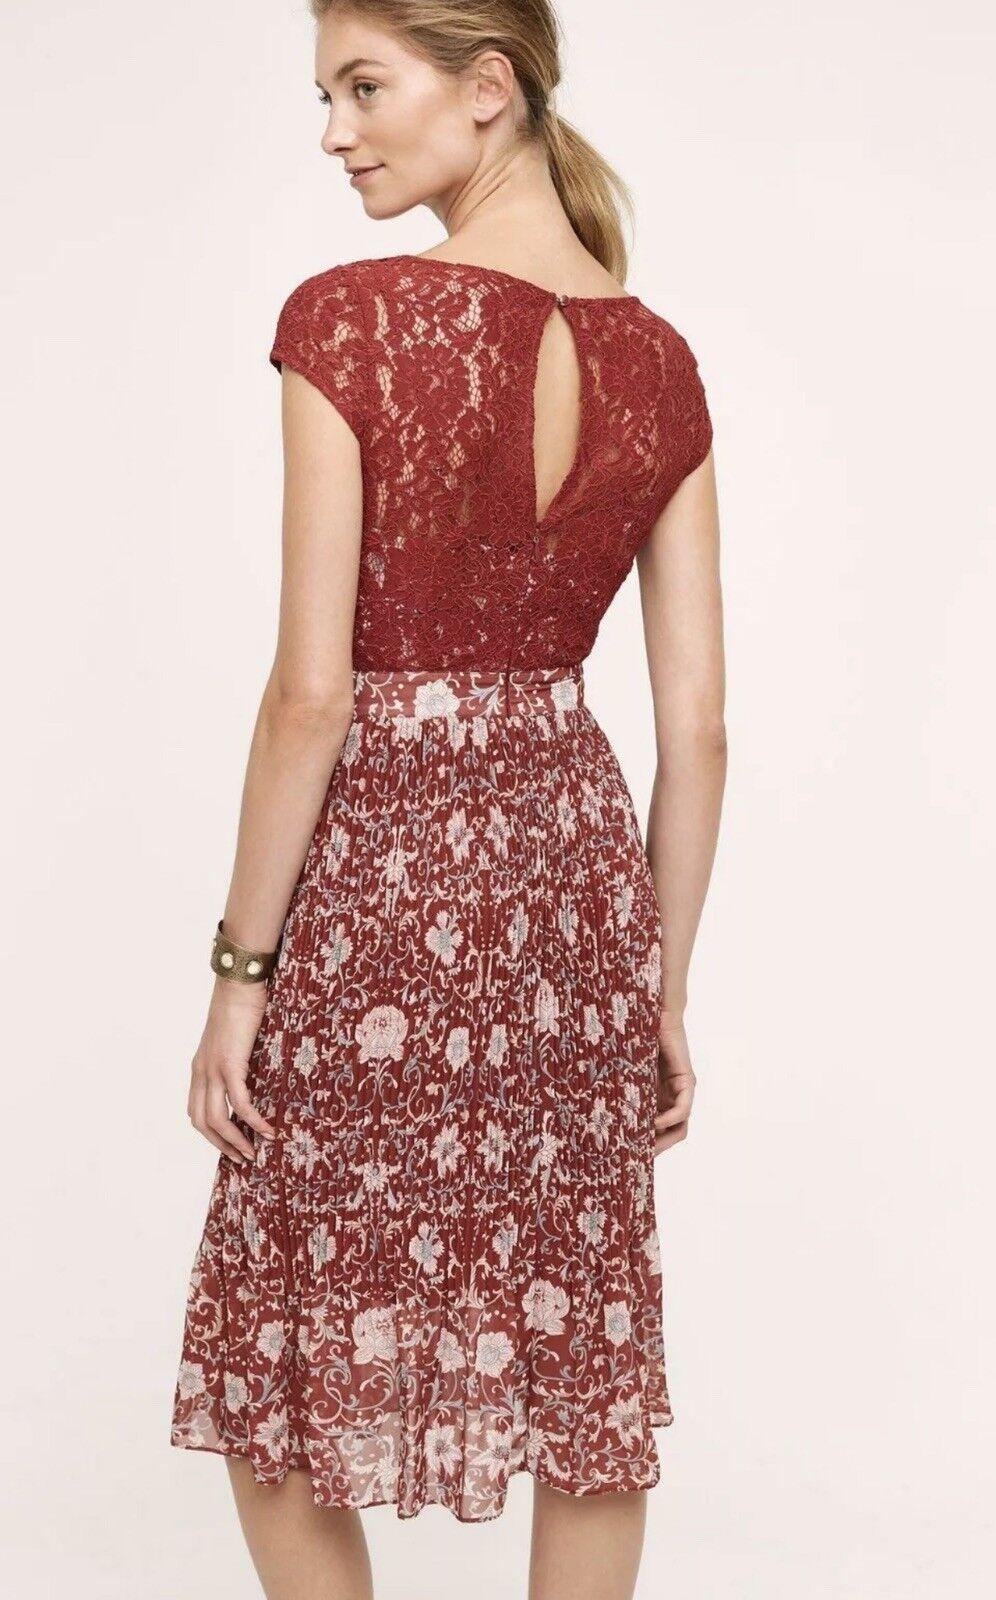 40b782fba8ed Anthropologie Plenty by Tracy Reese Arcadia Midi Dress Size 6 6 for sale  online | eBay